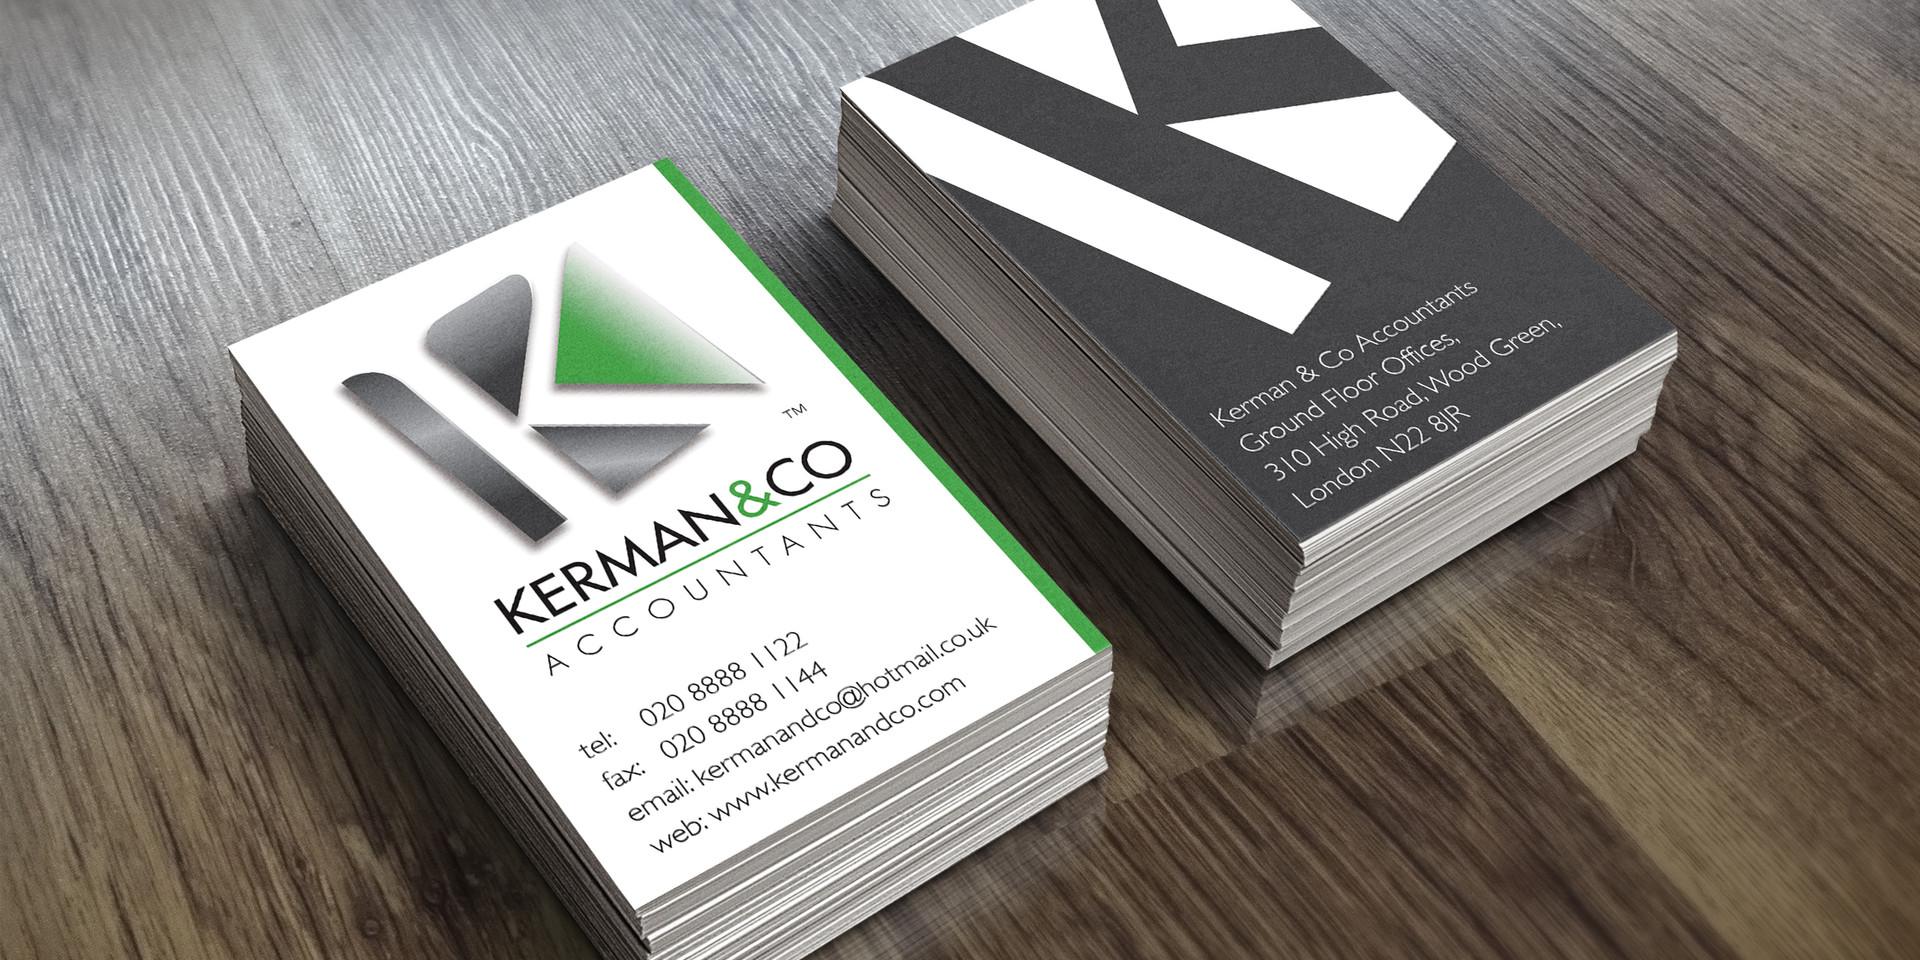 Kerman Business Card Mock-Up.jpg